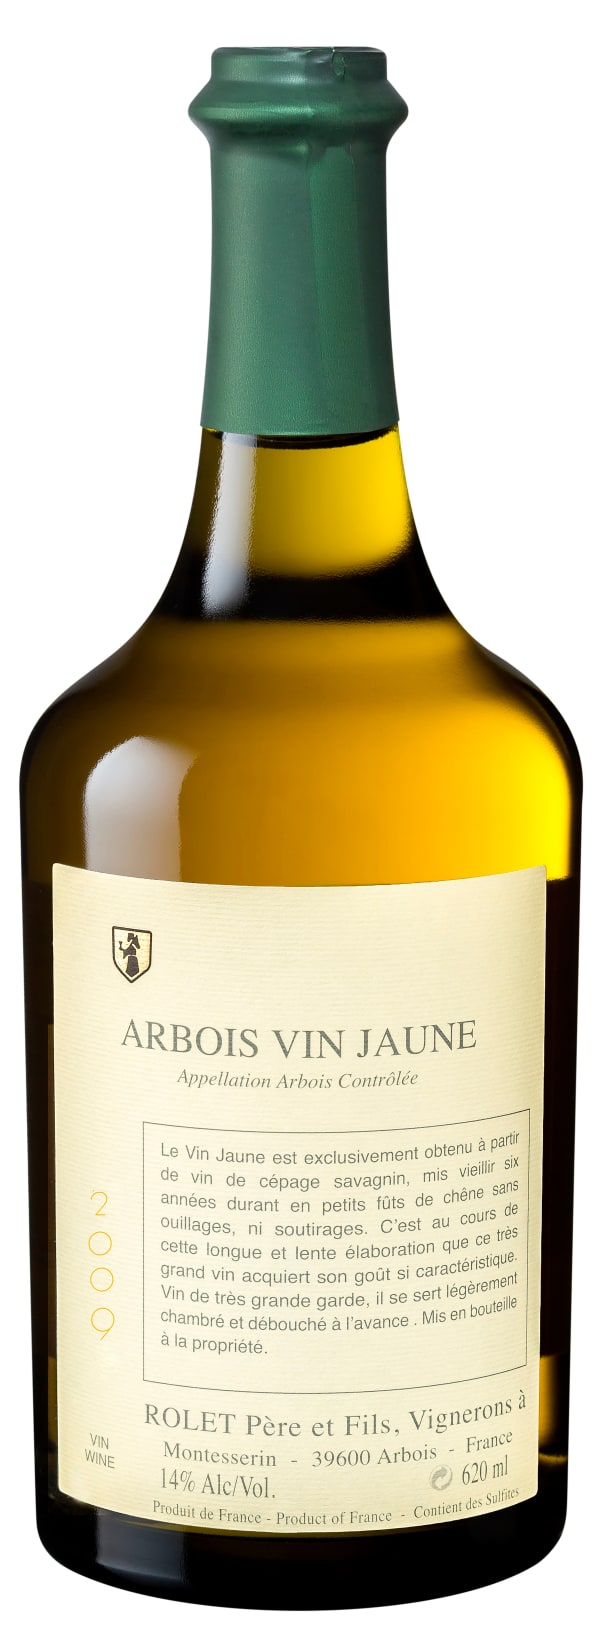 Rolet Arbois Vin Jaune 2009